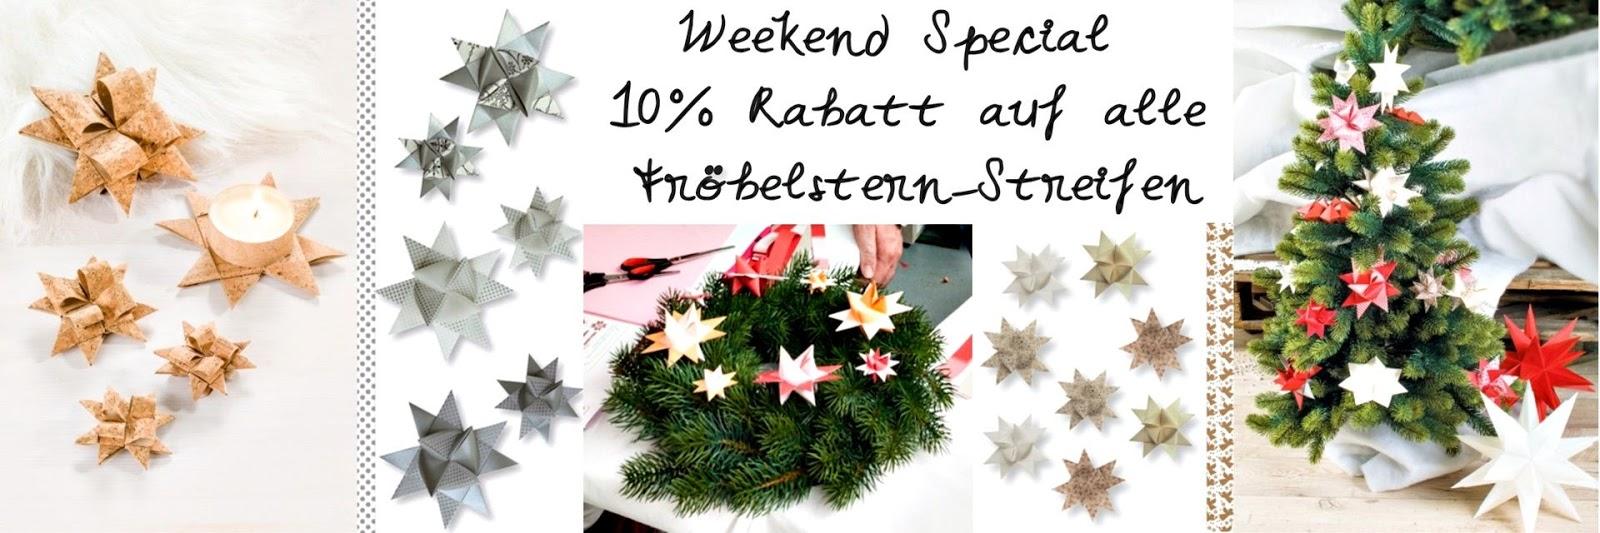 https://www.megahobby.de/bastel-material/basteln-papier/origamipapiere-aller-art/froebelstern-streifen.html